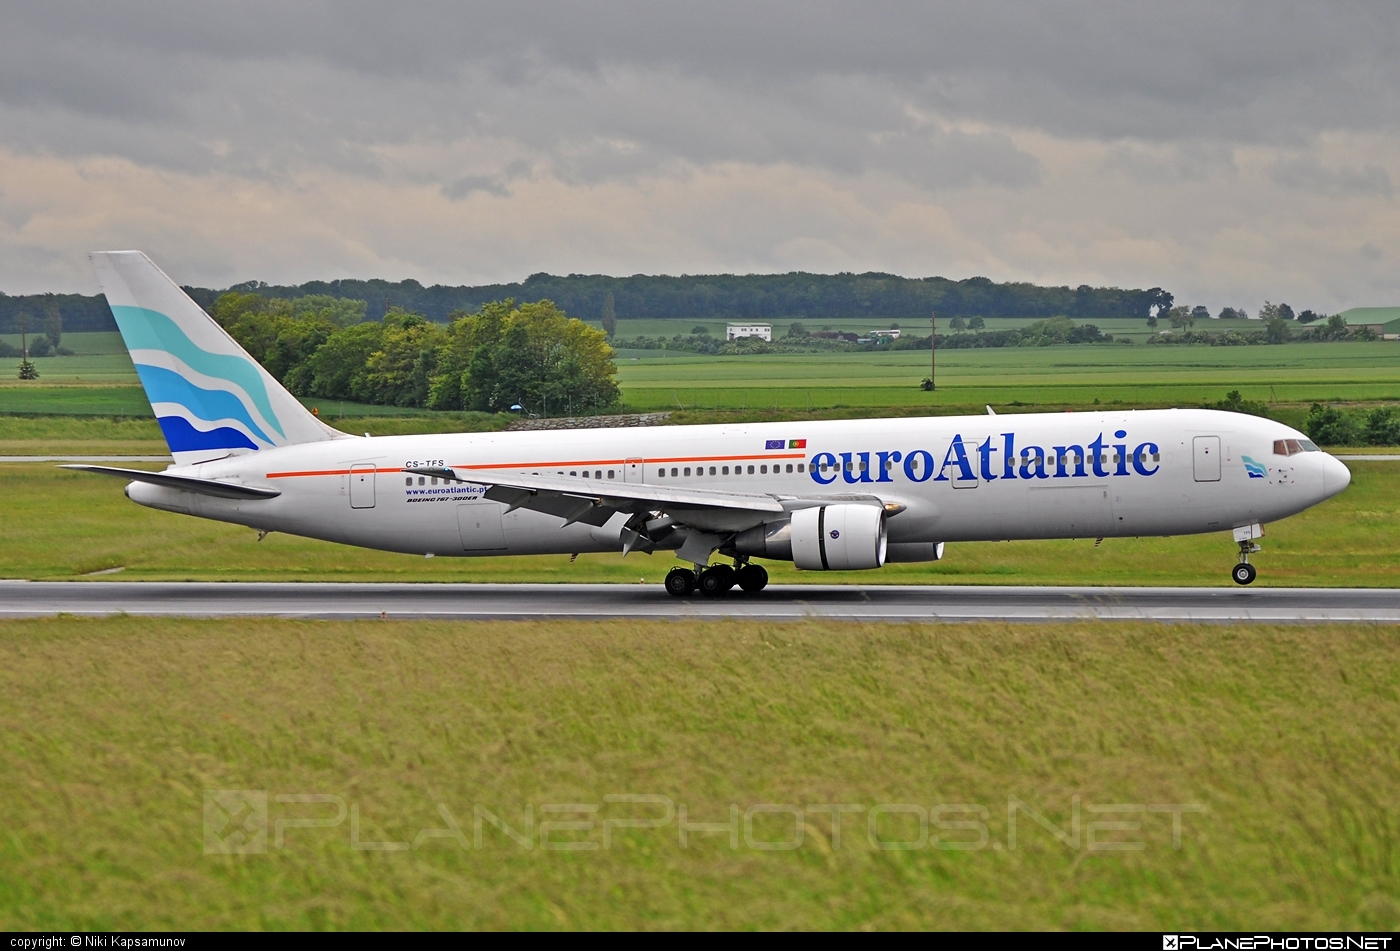 Boeing 767-300ER - CS-TFS operated by EuroAtlantic Airways #b767 #b767er #boeing #boeing767 #euroatlantic #euroatlanticairways